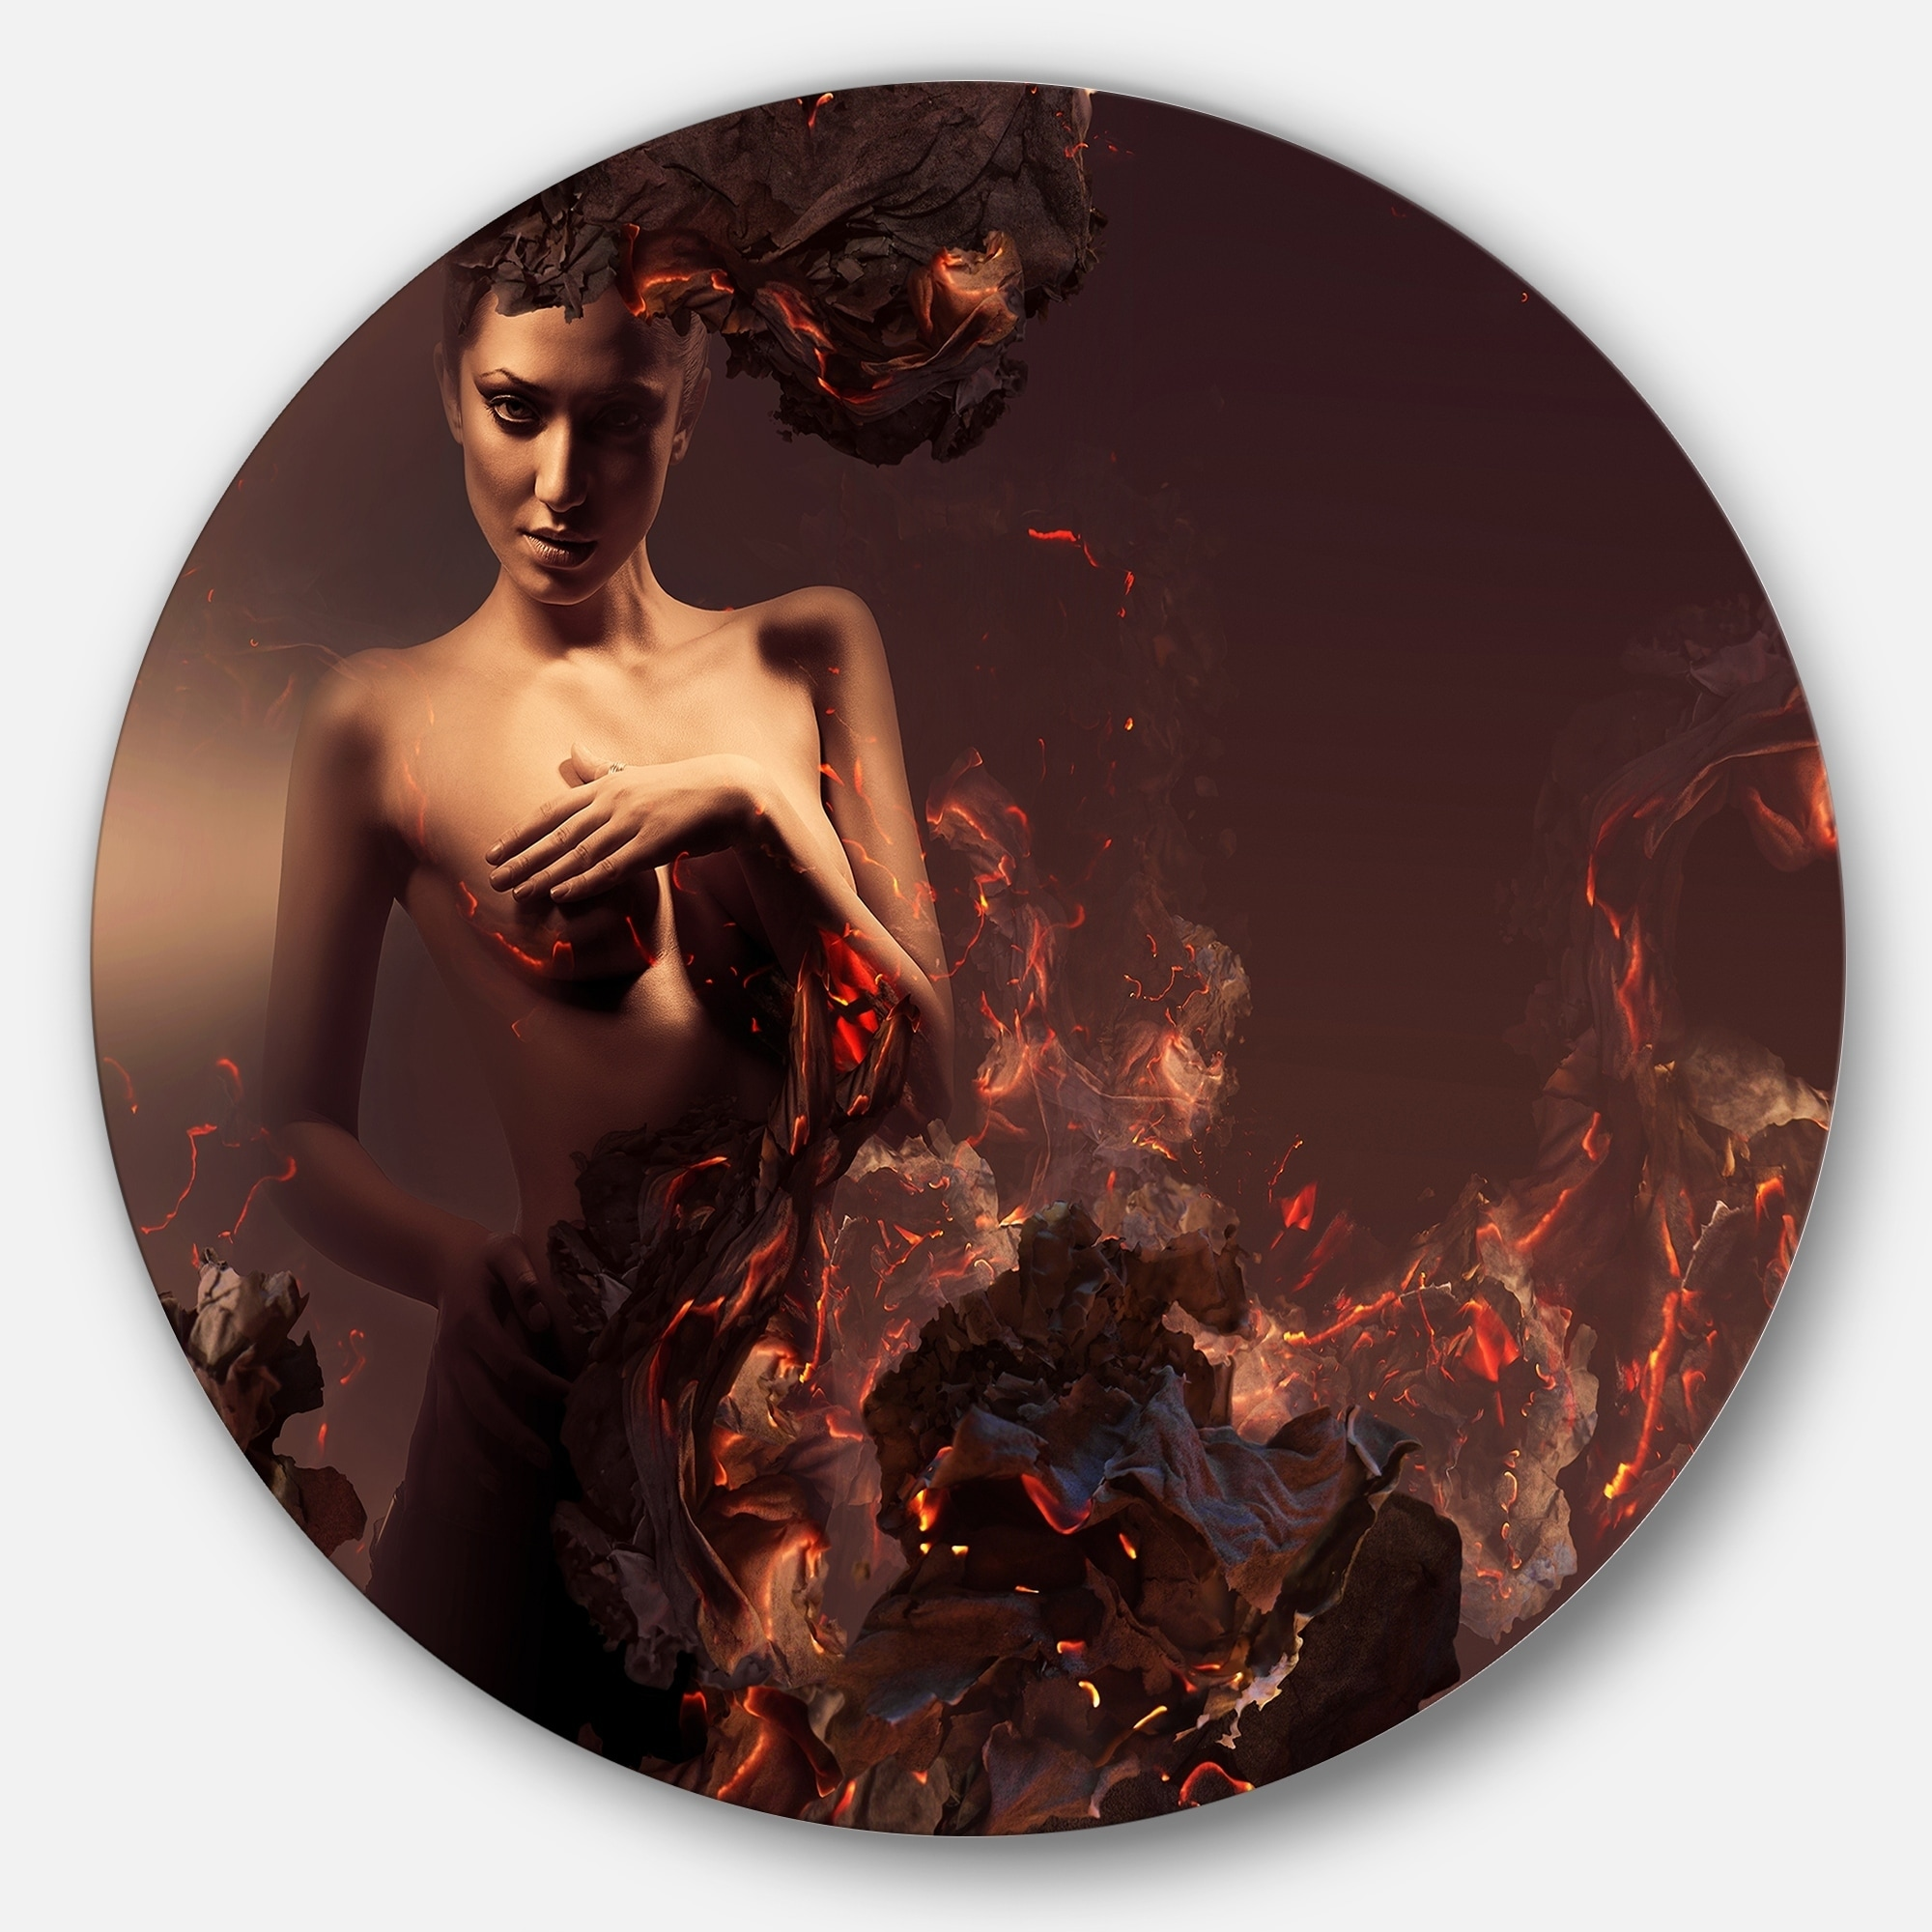 Designart 'Nude Woman in Burning Ashes' Portrait Art Larg...